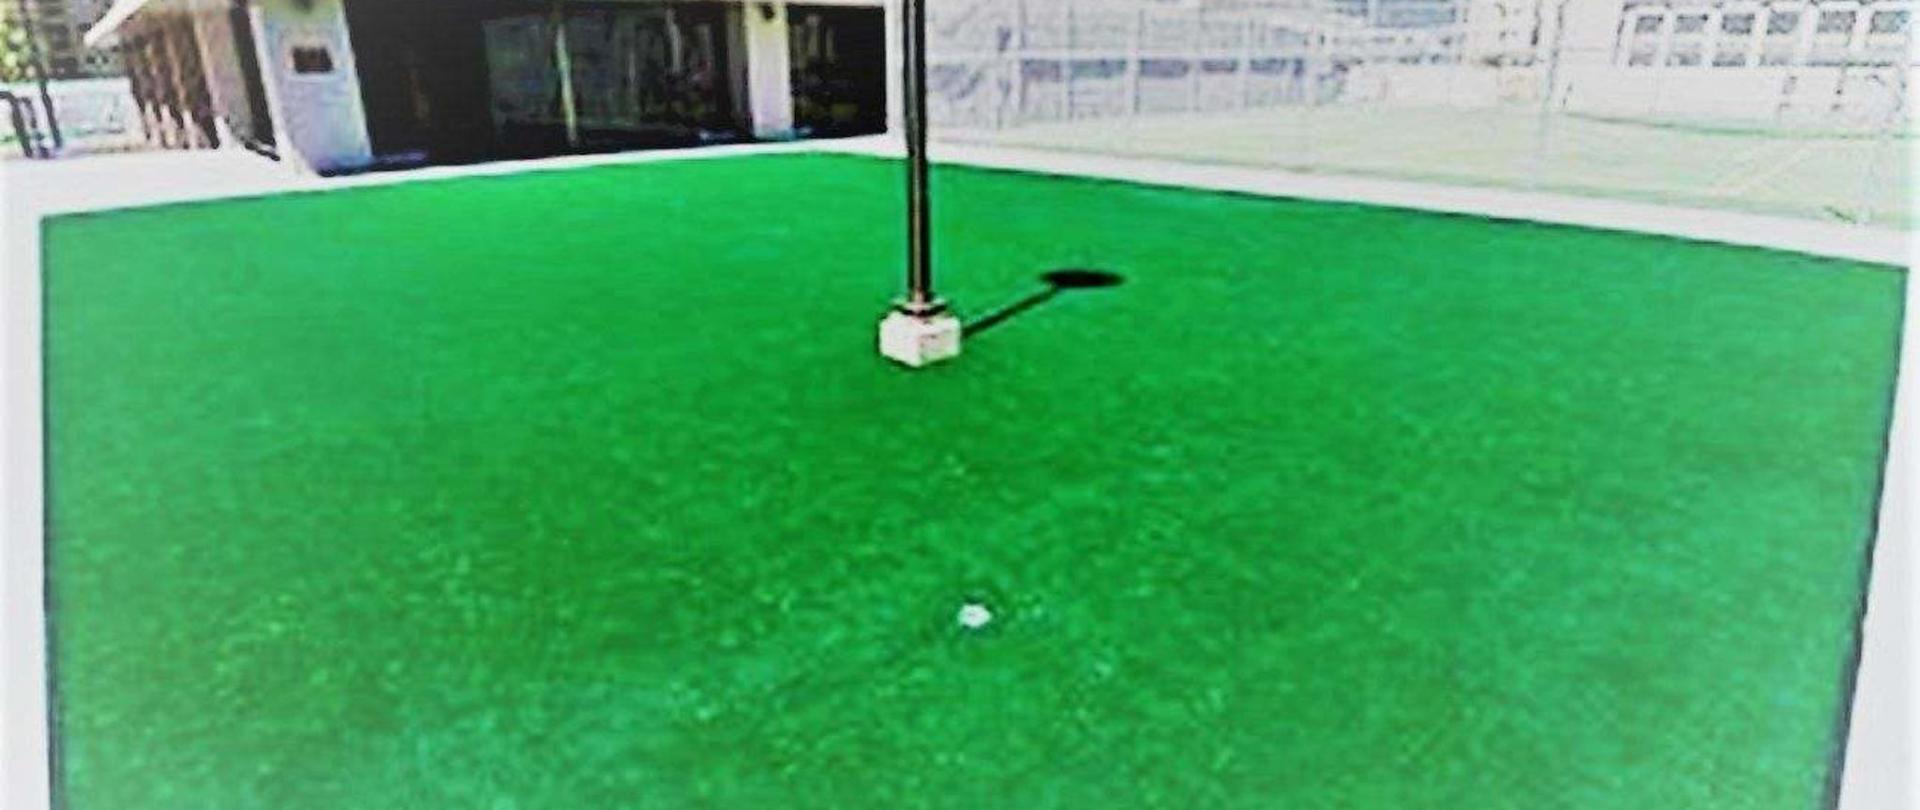 rk-golf-1.jpg